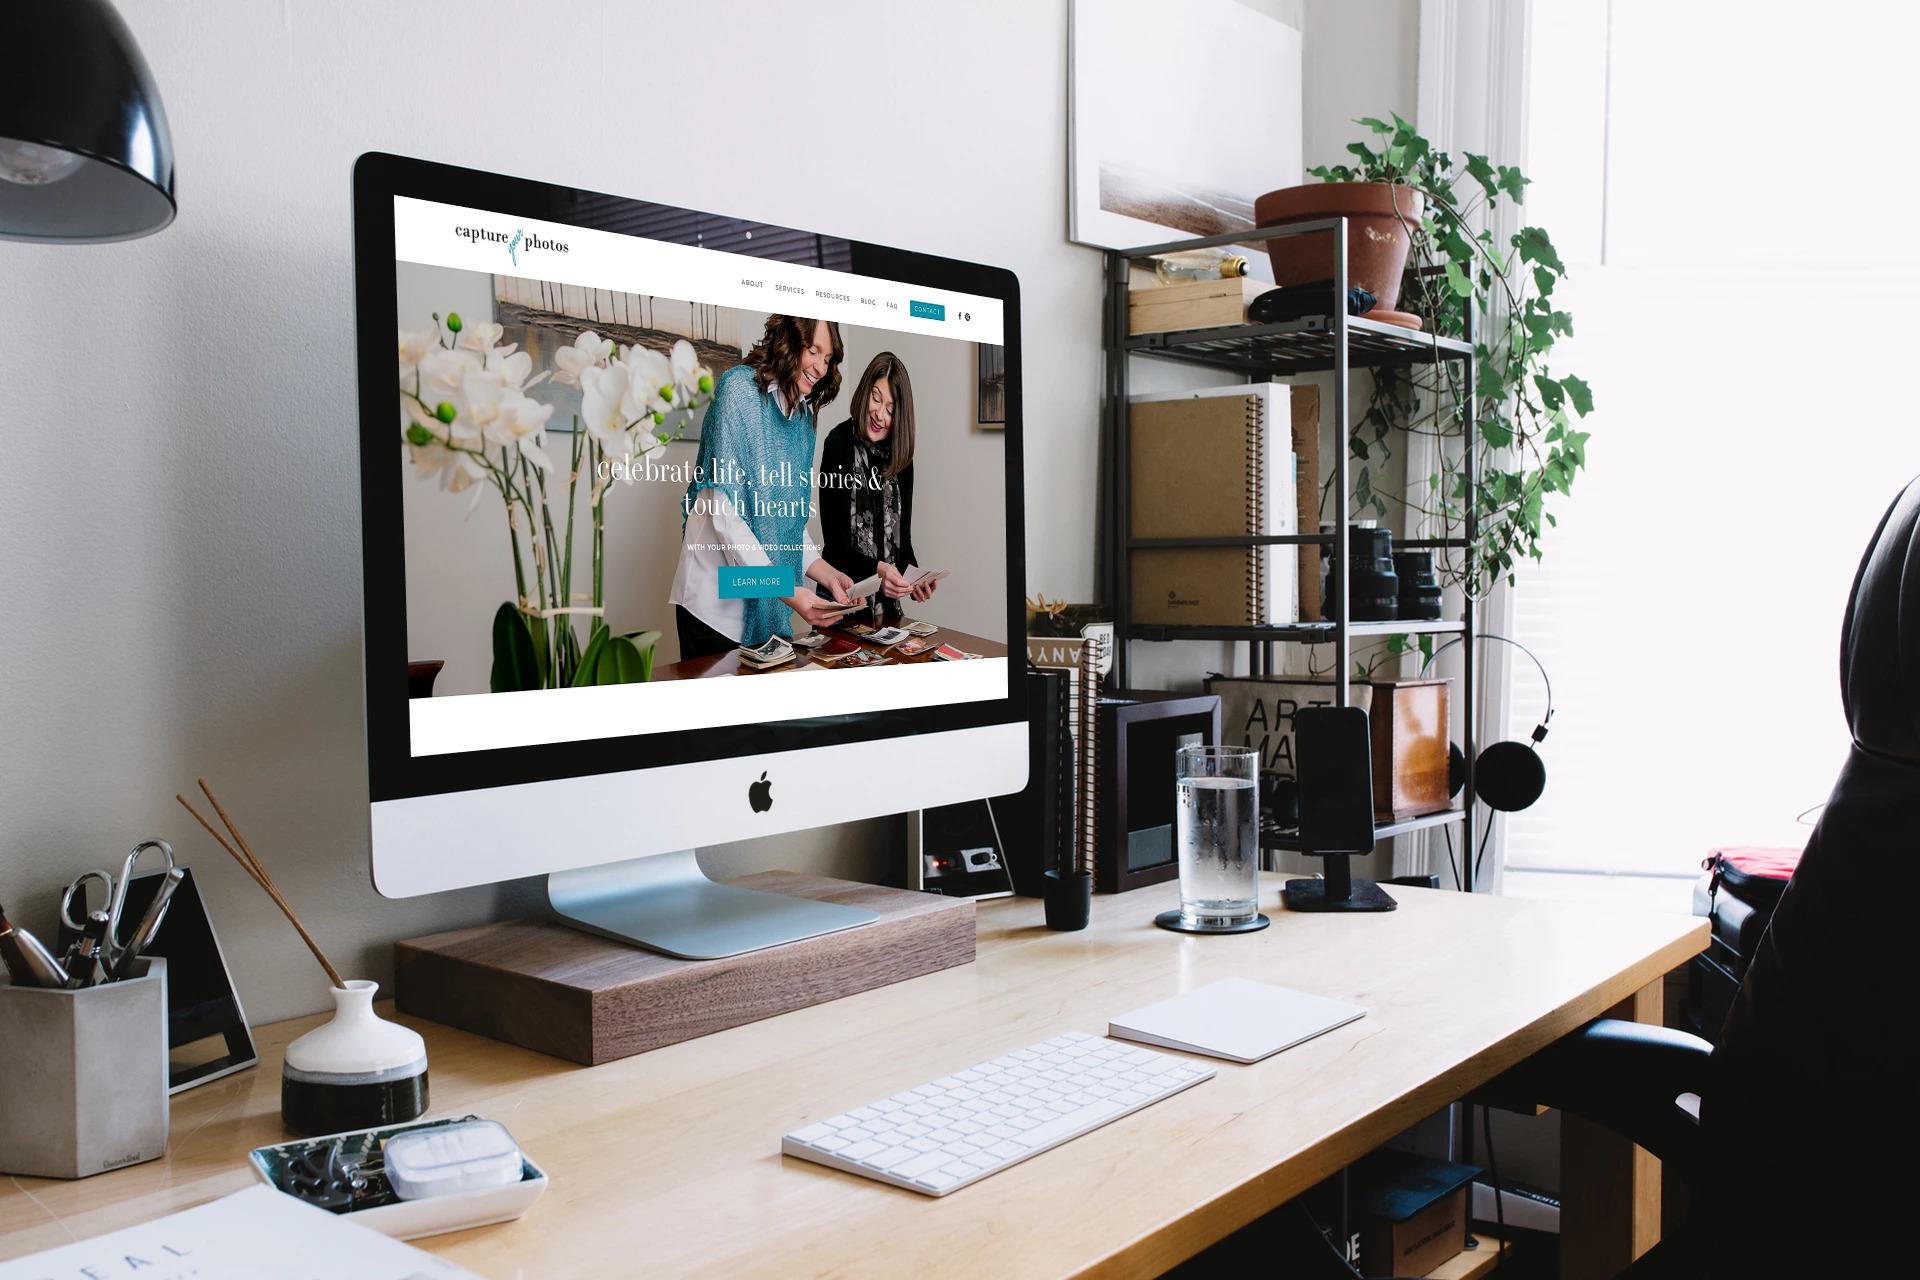 Capture Your Photos | Photo Organizing